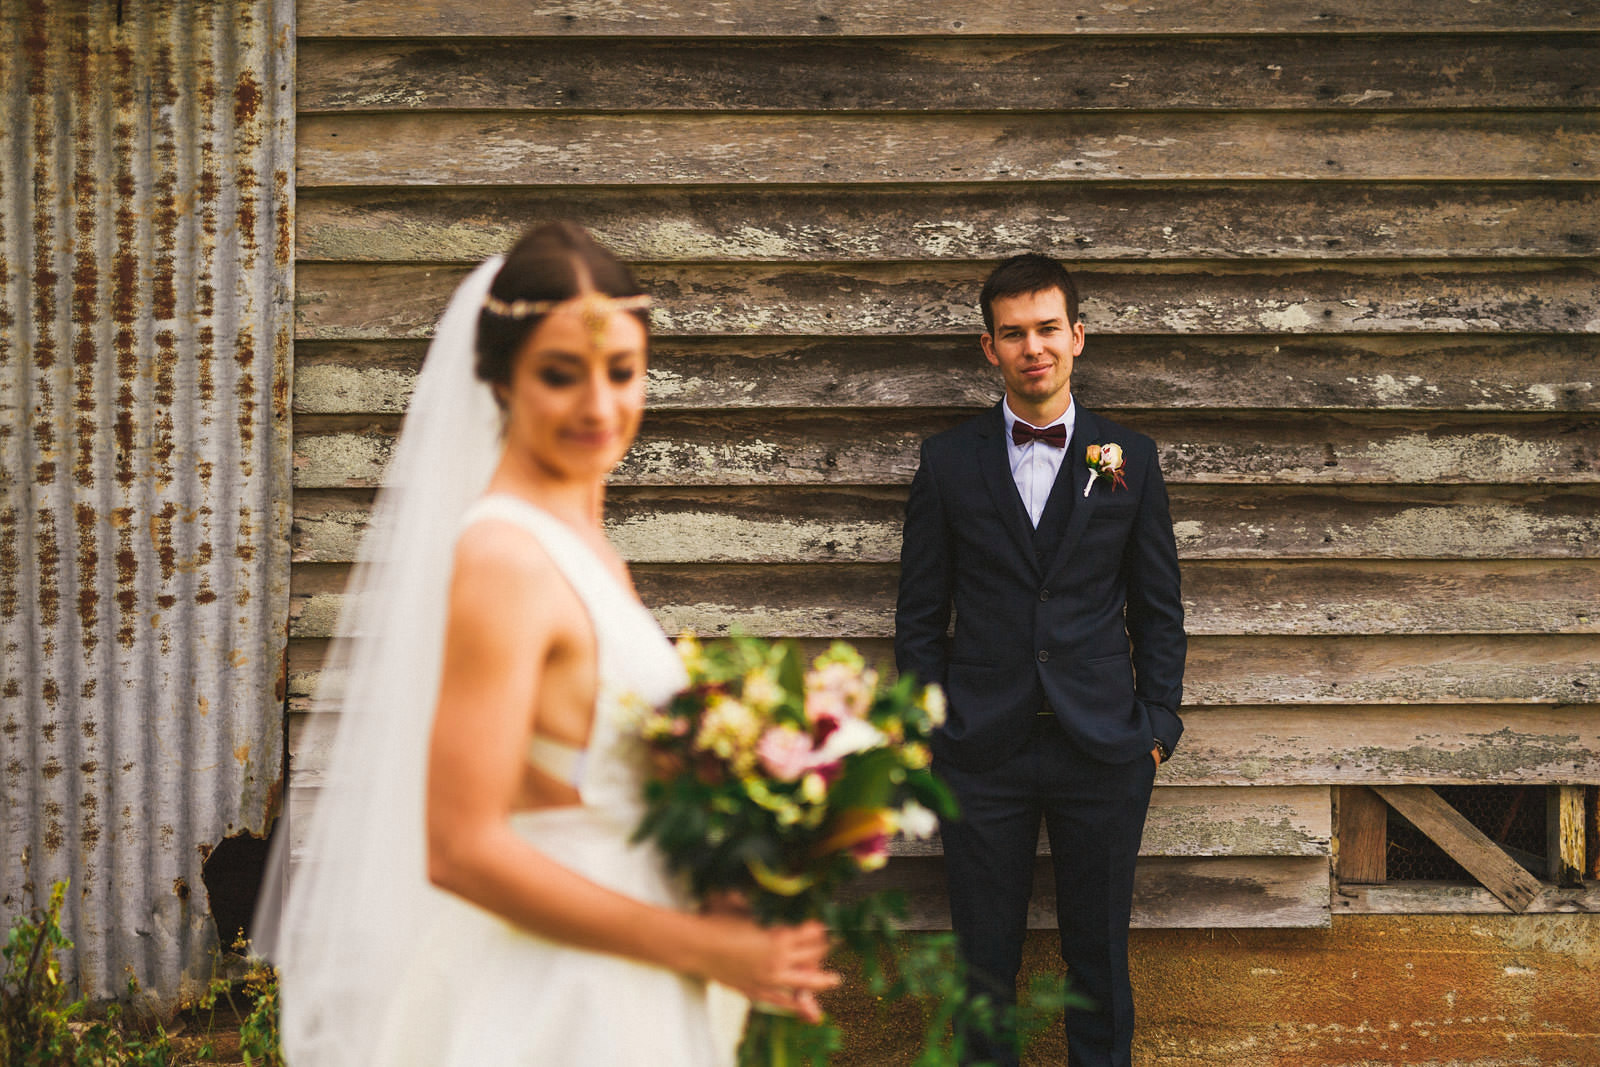 tablelands_wedding_0034